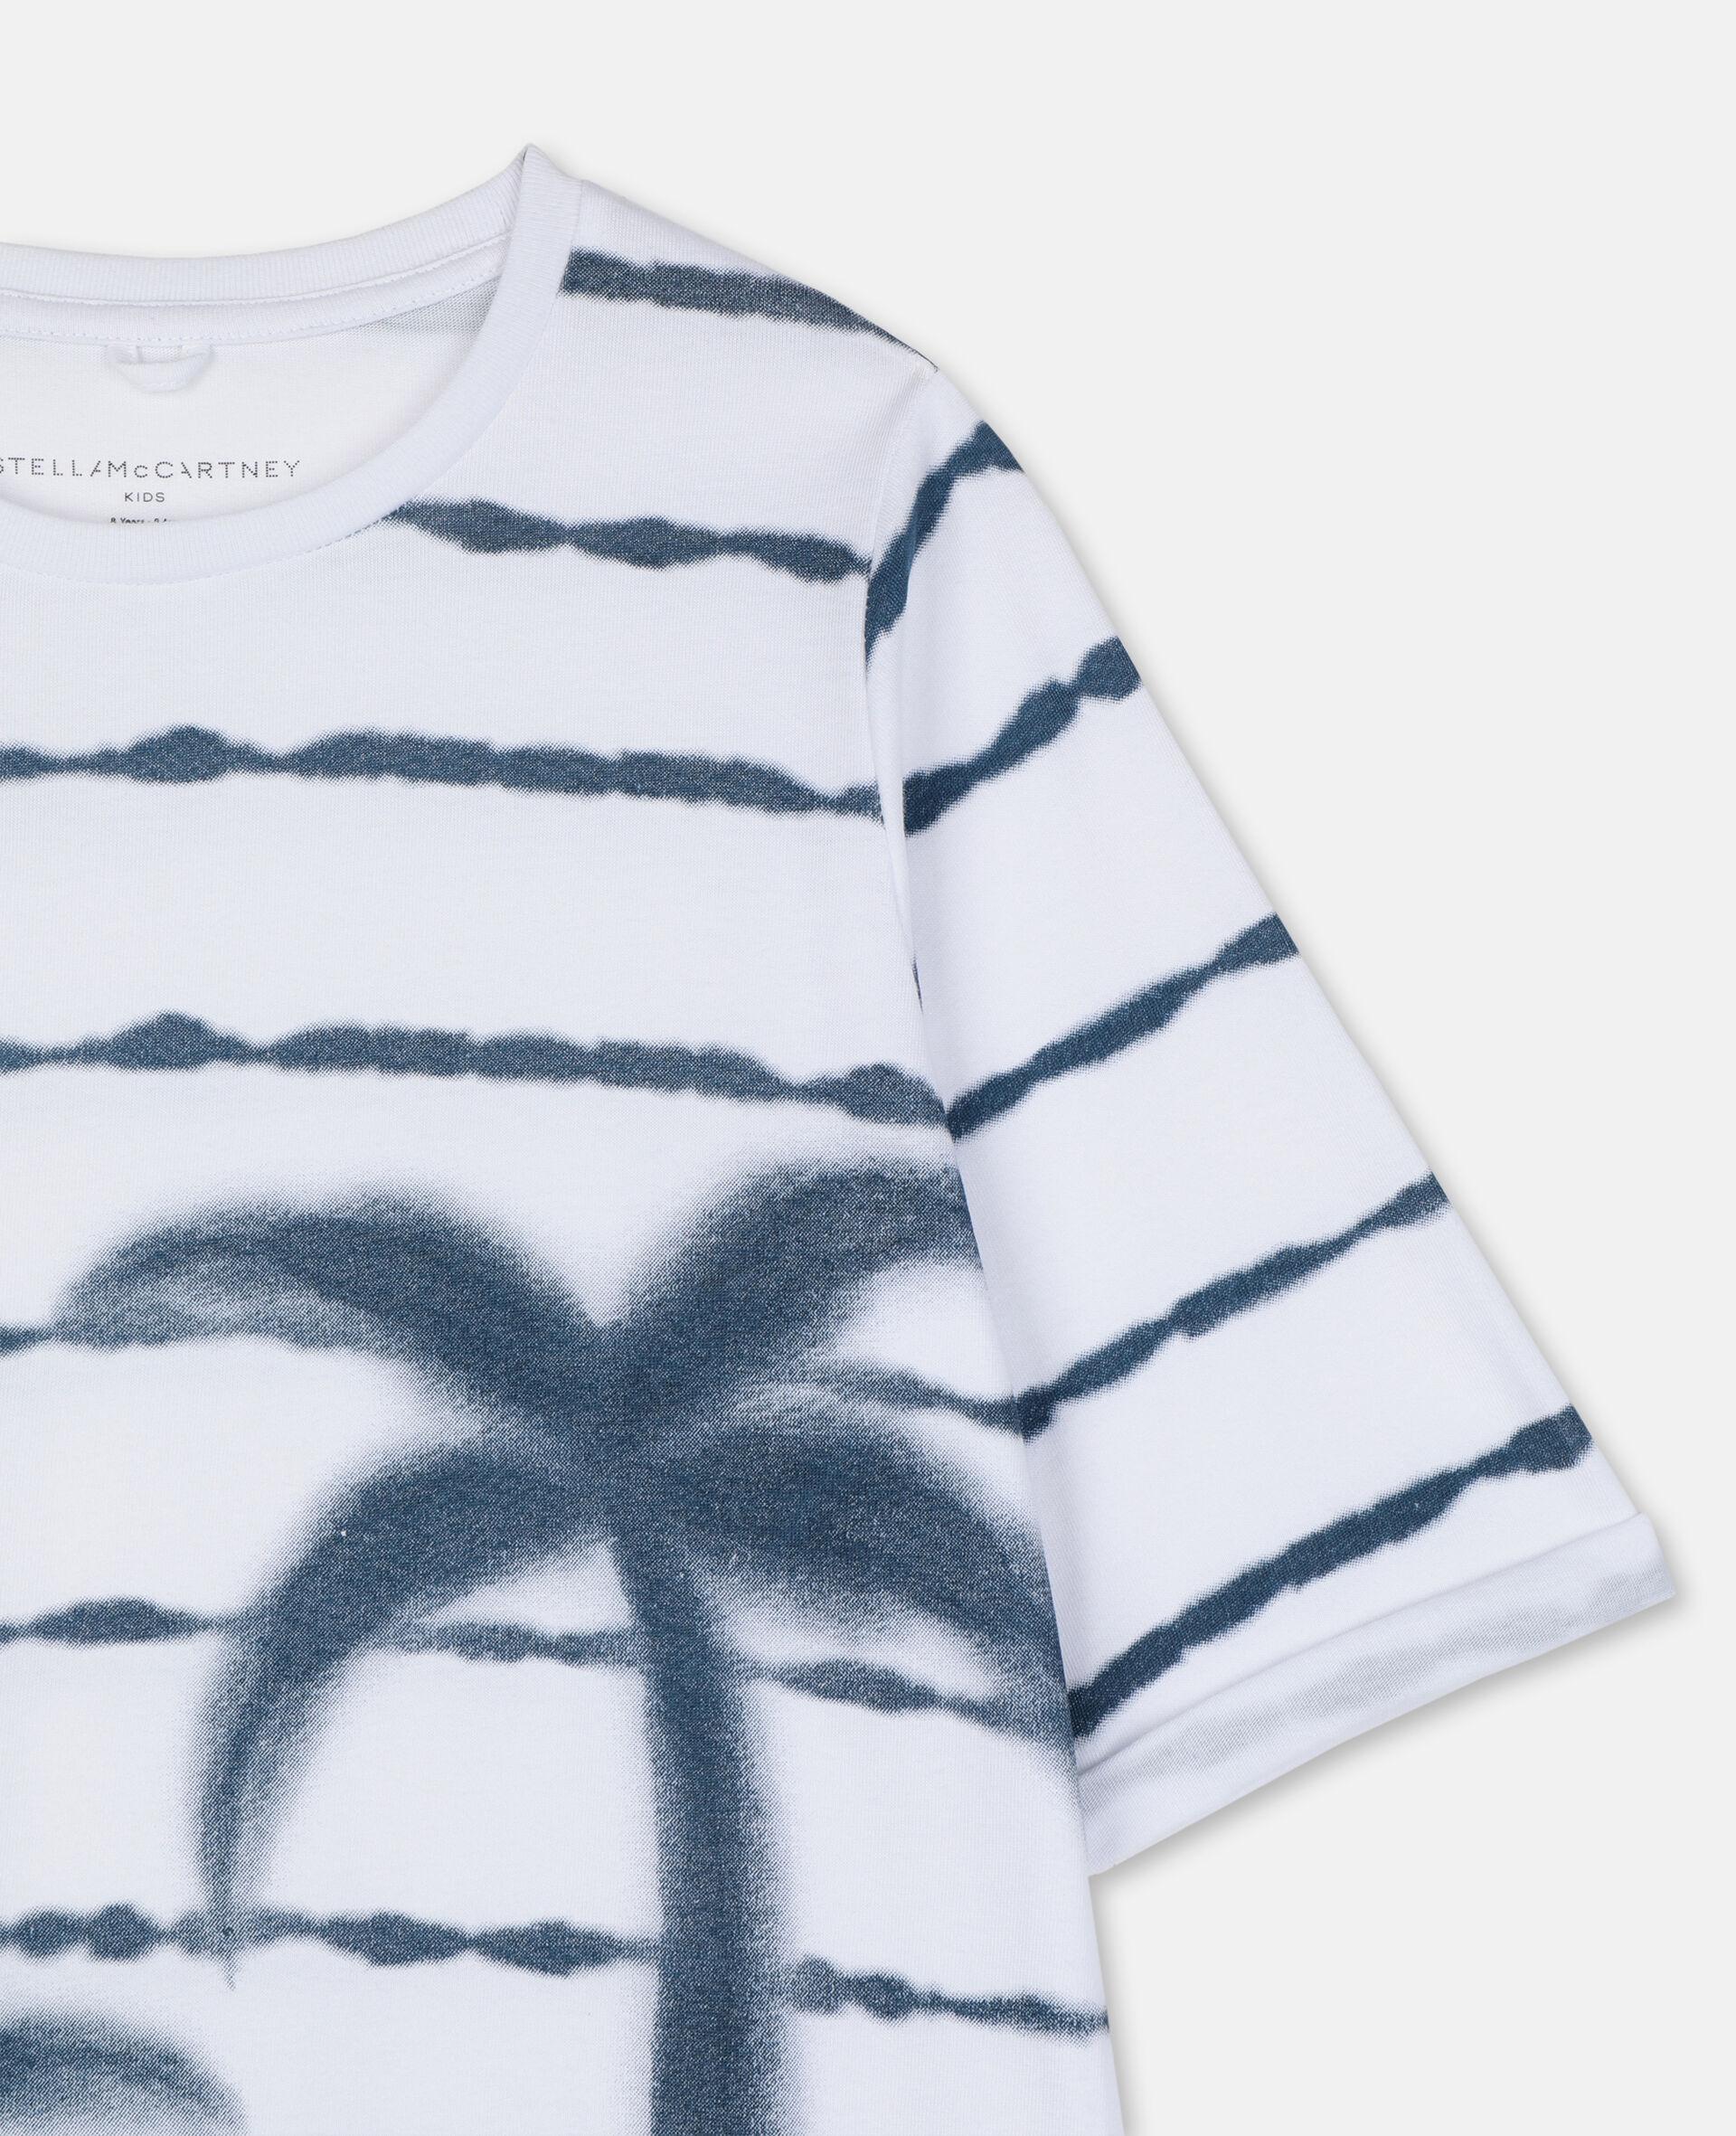 Palms Cotton Dress-White-large image number 1